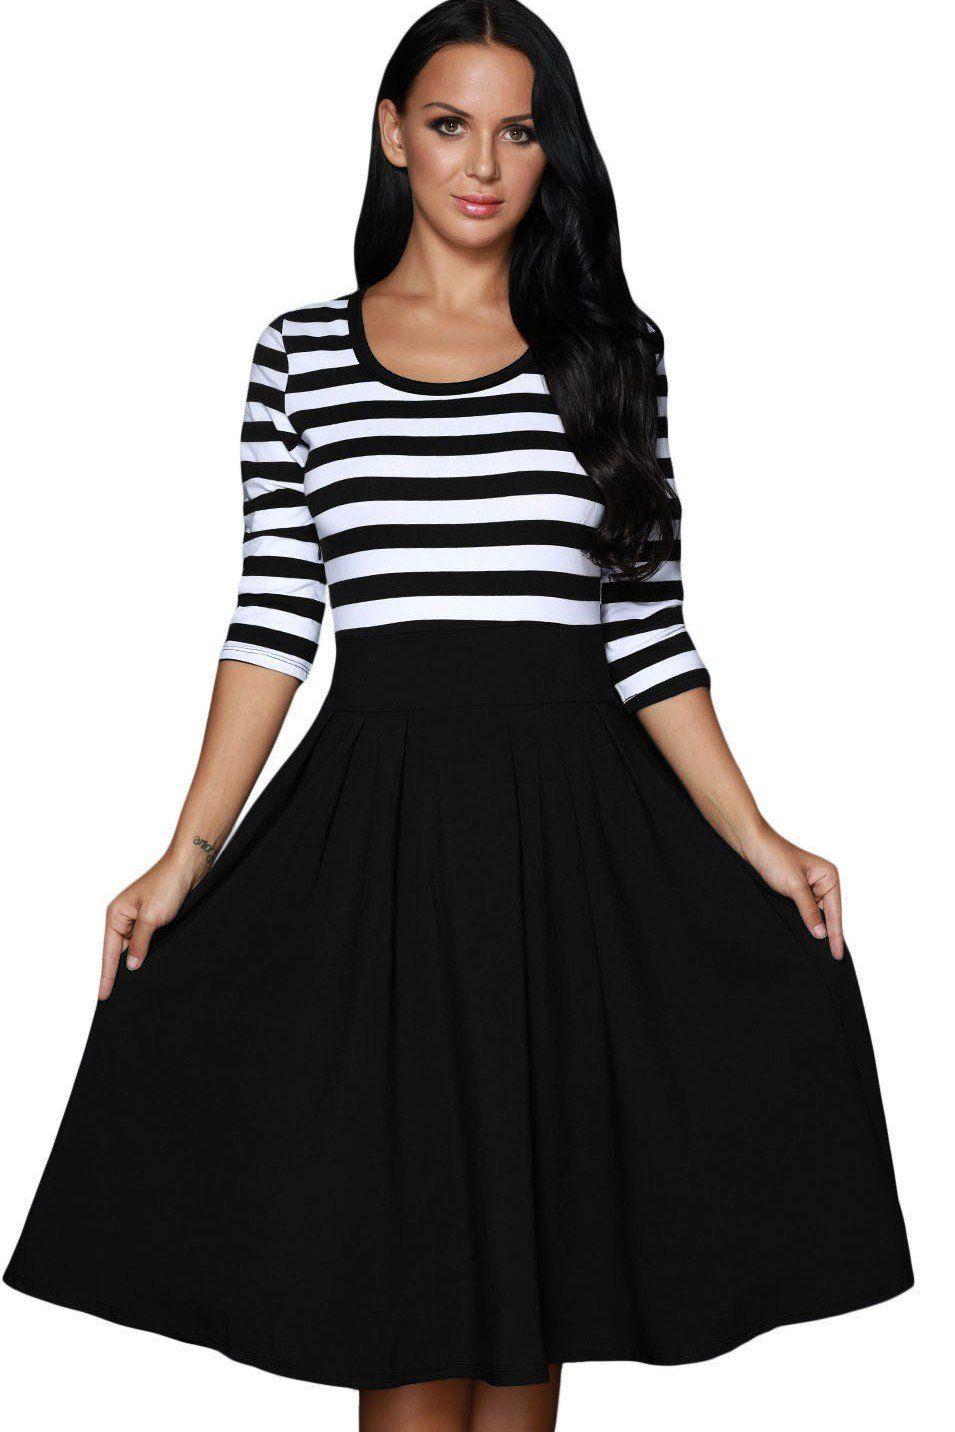 Robe Patineuse Manches Longues Mi Longue Raye Noir Blanc Retro ... 368df8dd928